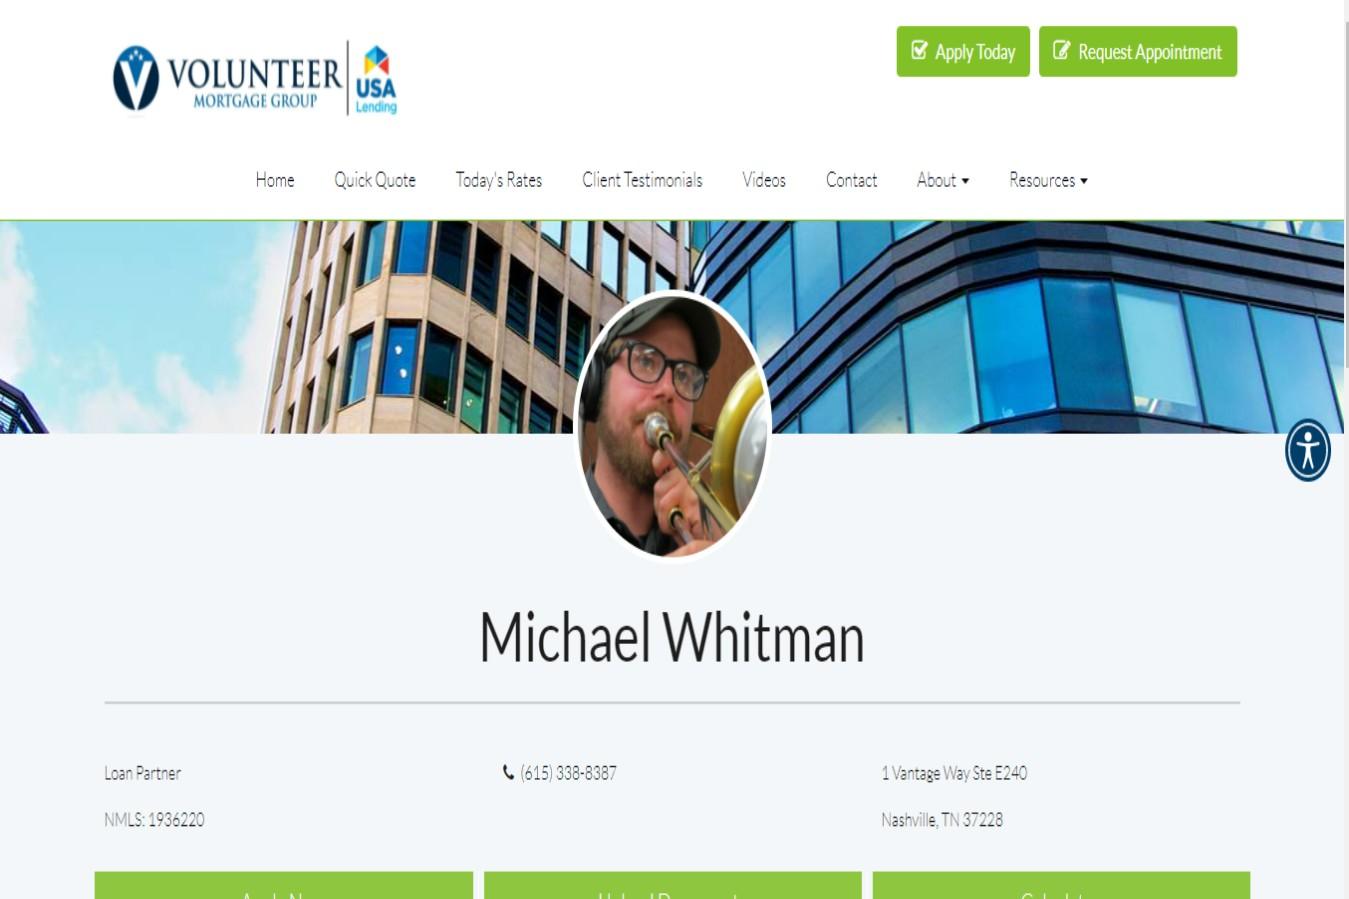 Whitman Best Mortgage Brokers in Nashville, TN